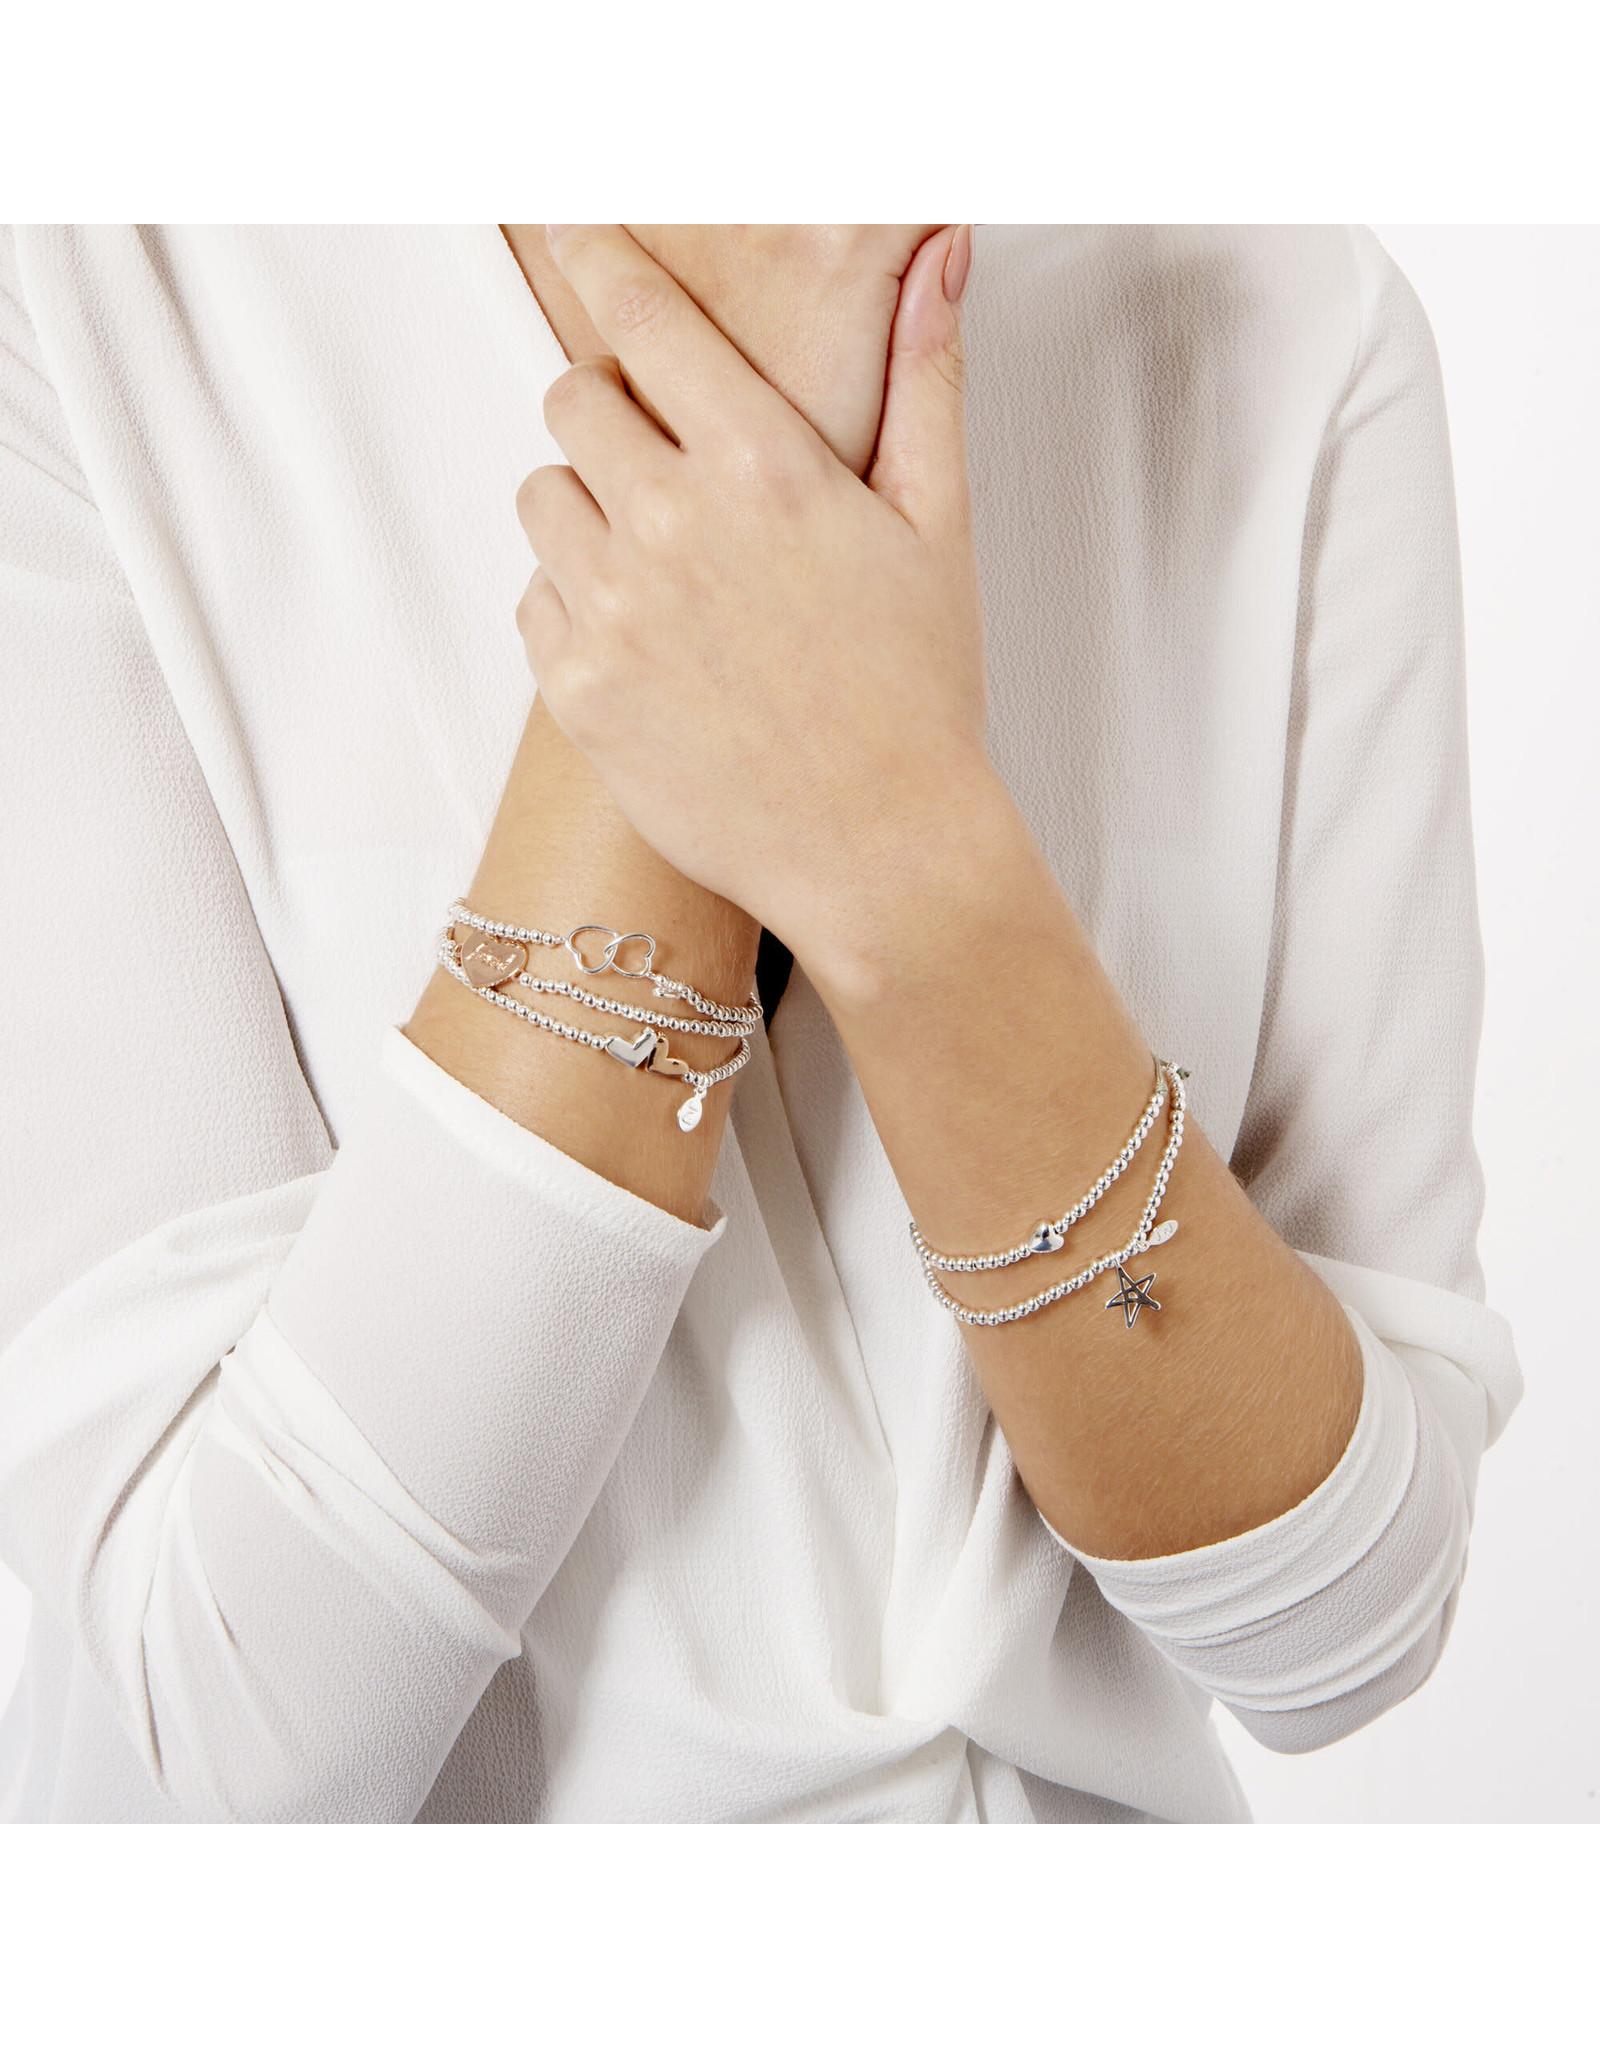 Joma Jewellery A Little - Friendship - Armband